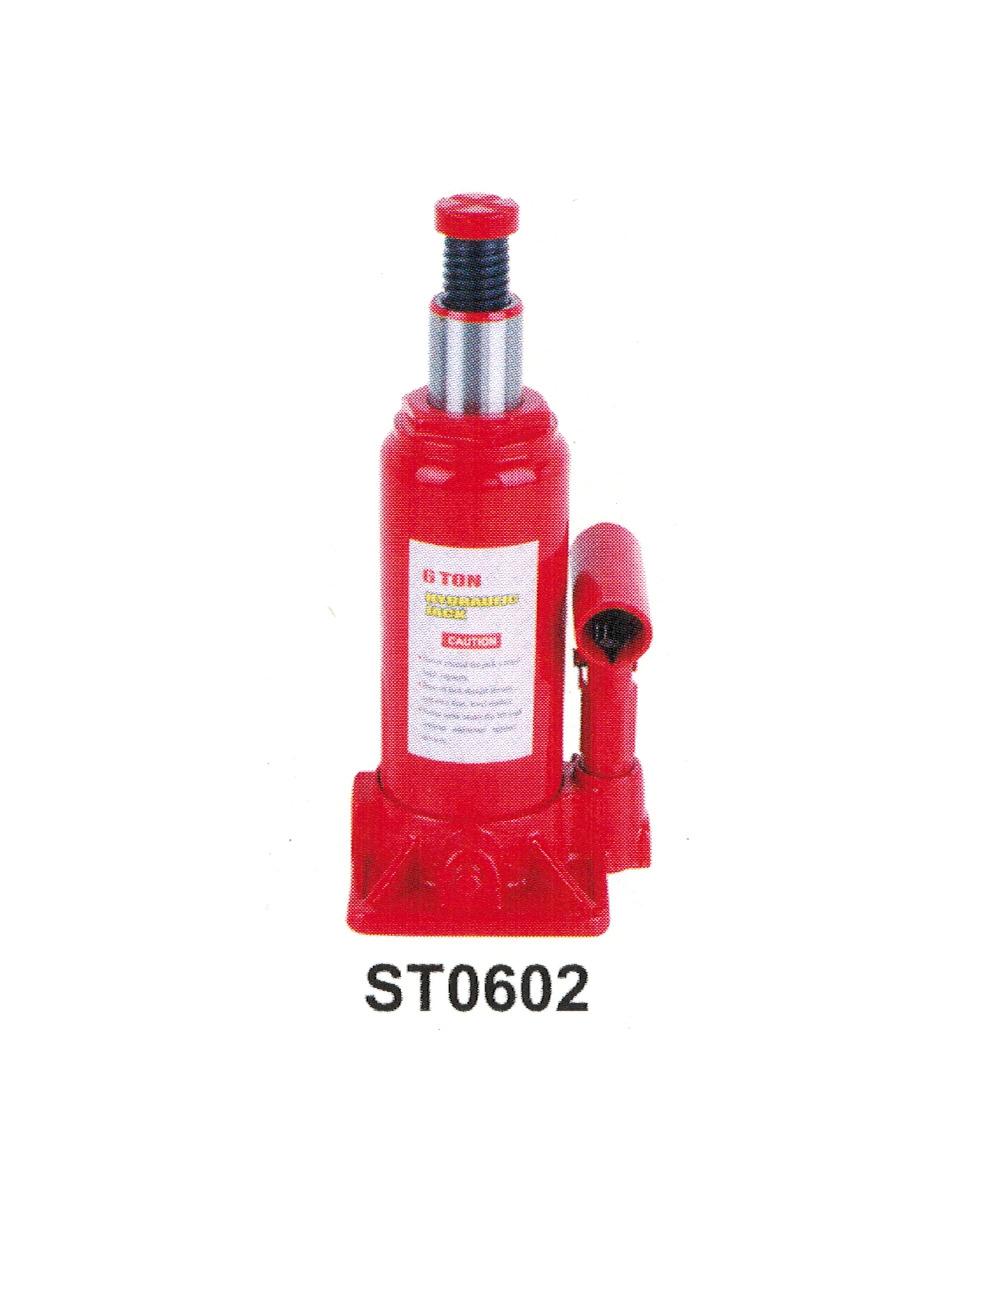 Hydraulic bottle jacks vertical 6t car jack auto repair equipment emergency tool supply(China (Mainland))